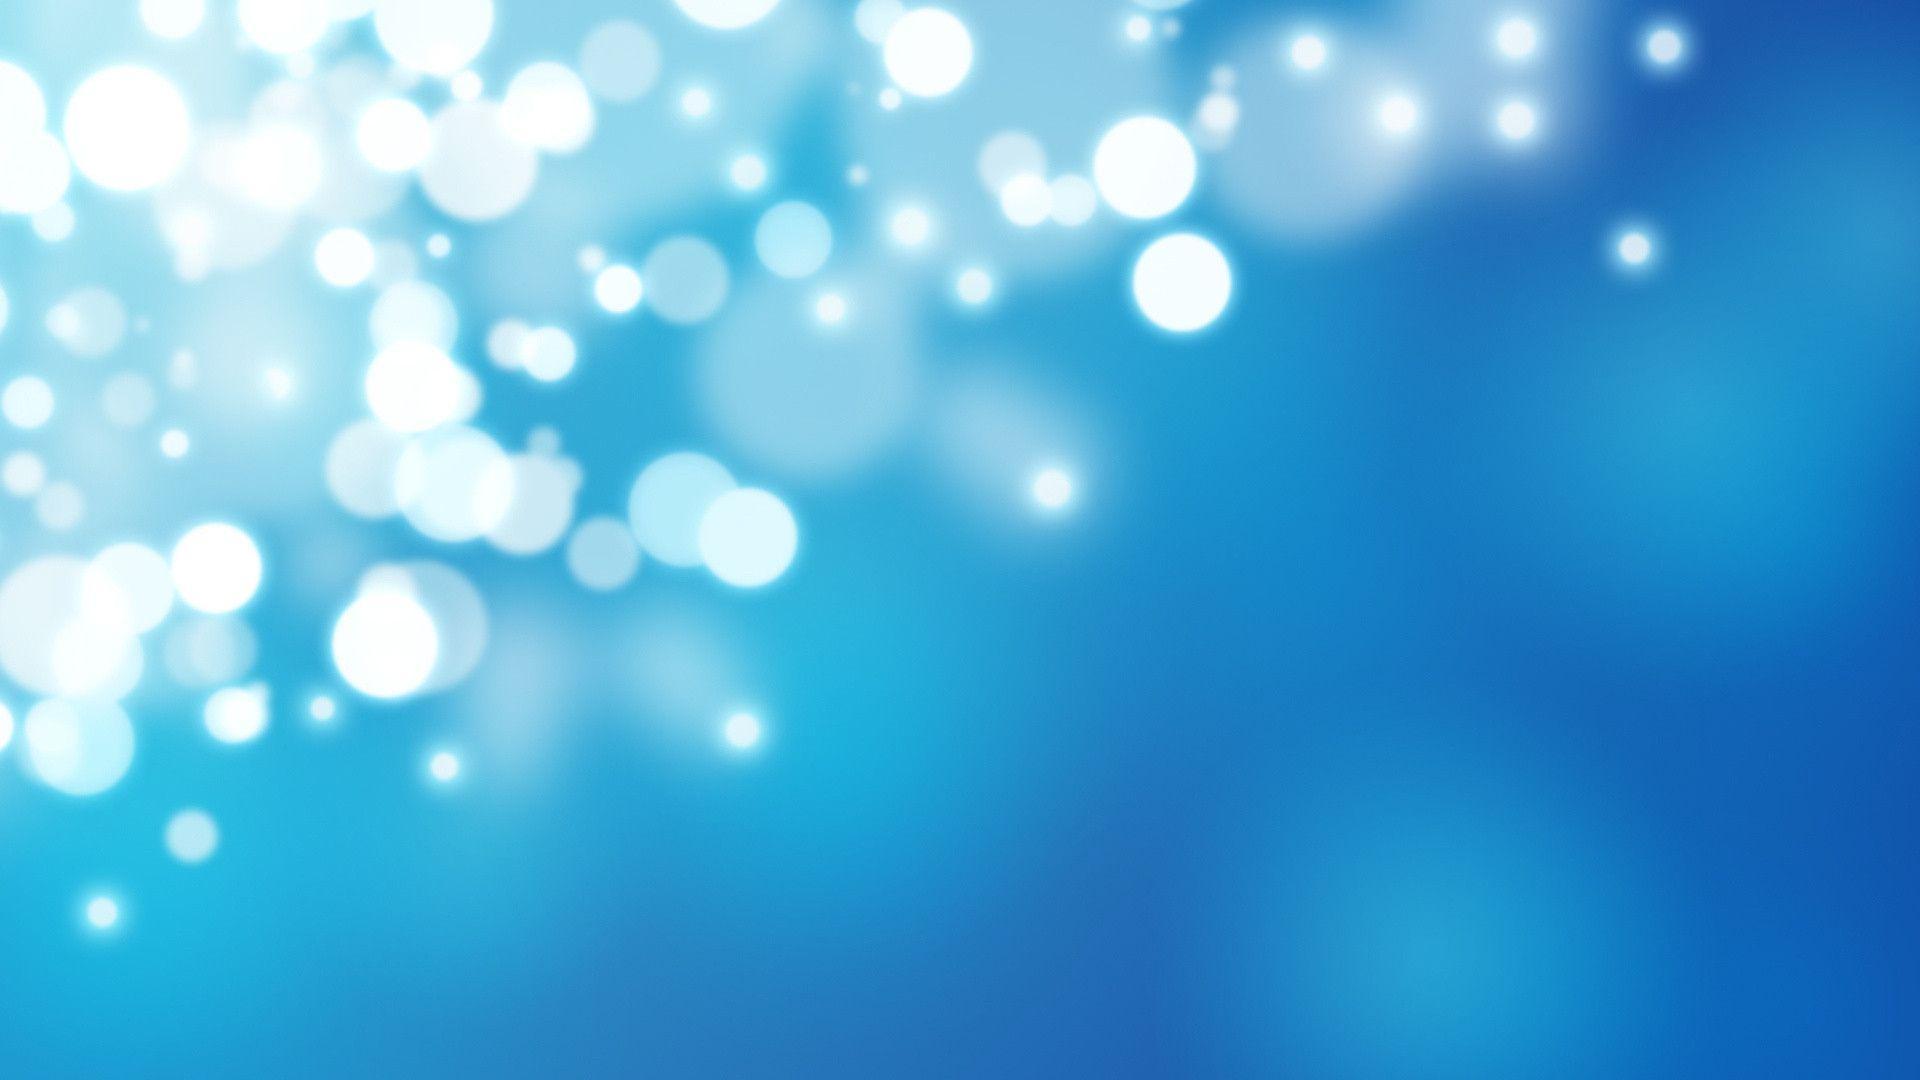 Light Blue Backgrounds